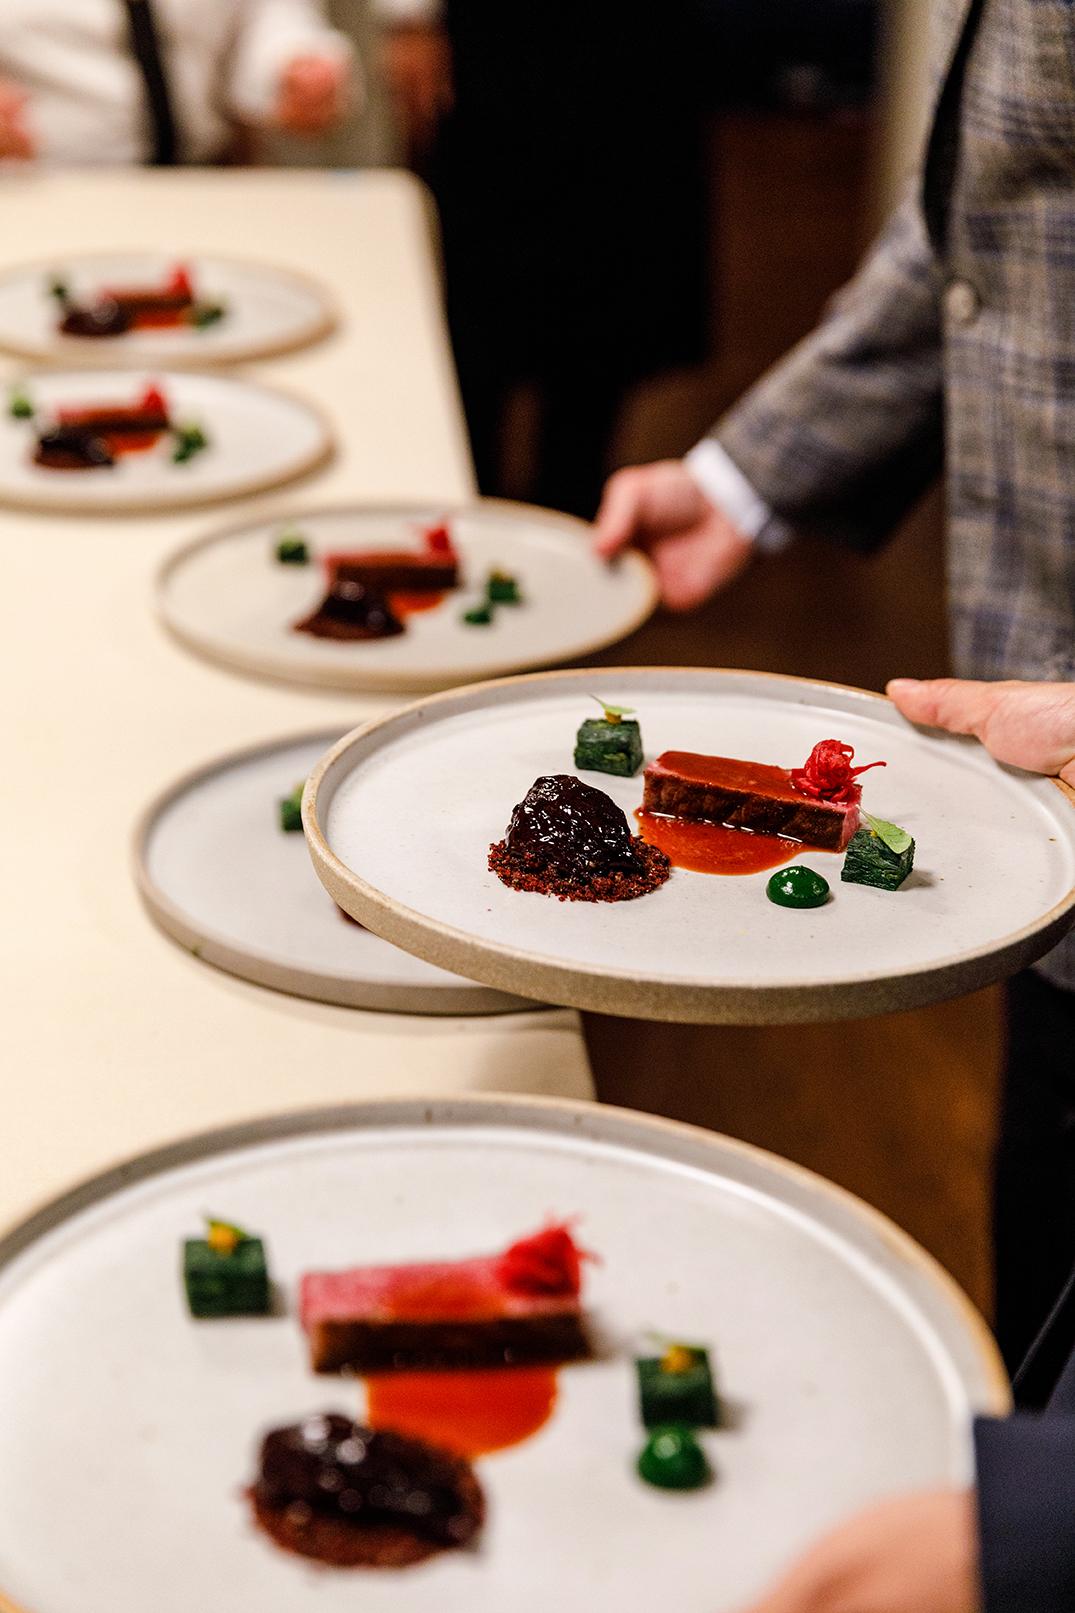 Beef at The Art of Plating x SingleThread x Olivier Bernstein dinner © Nader Khouri